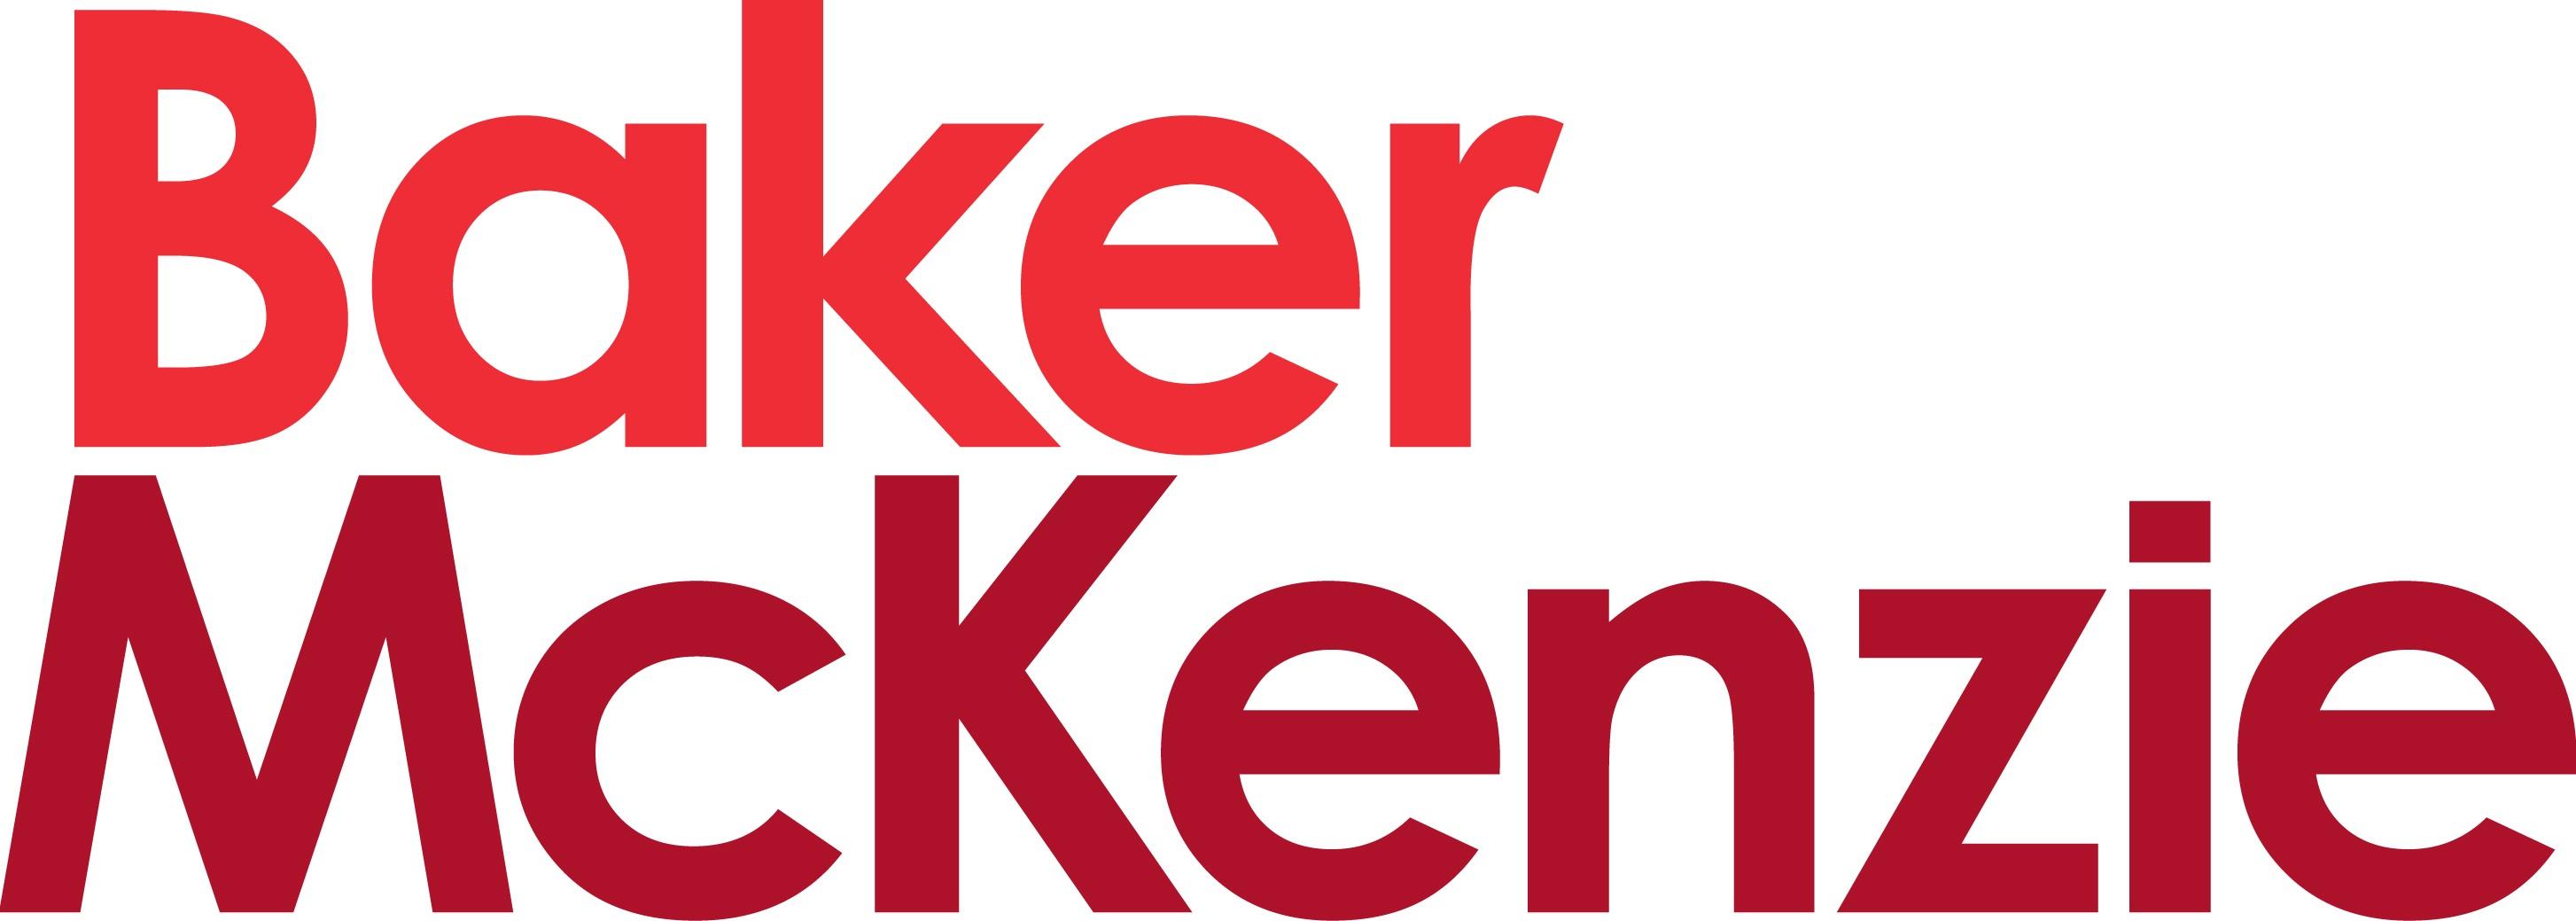 Baker_McKenzie_Logo big